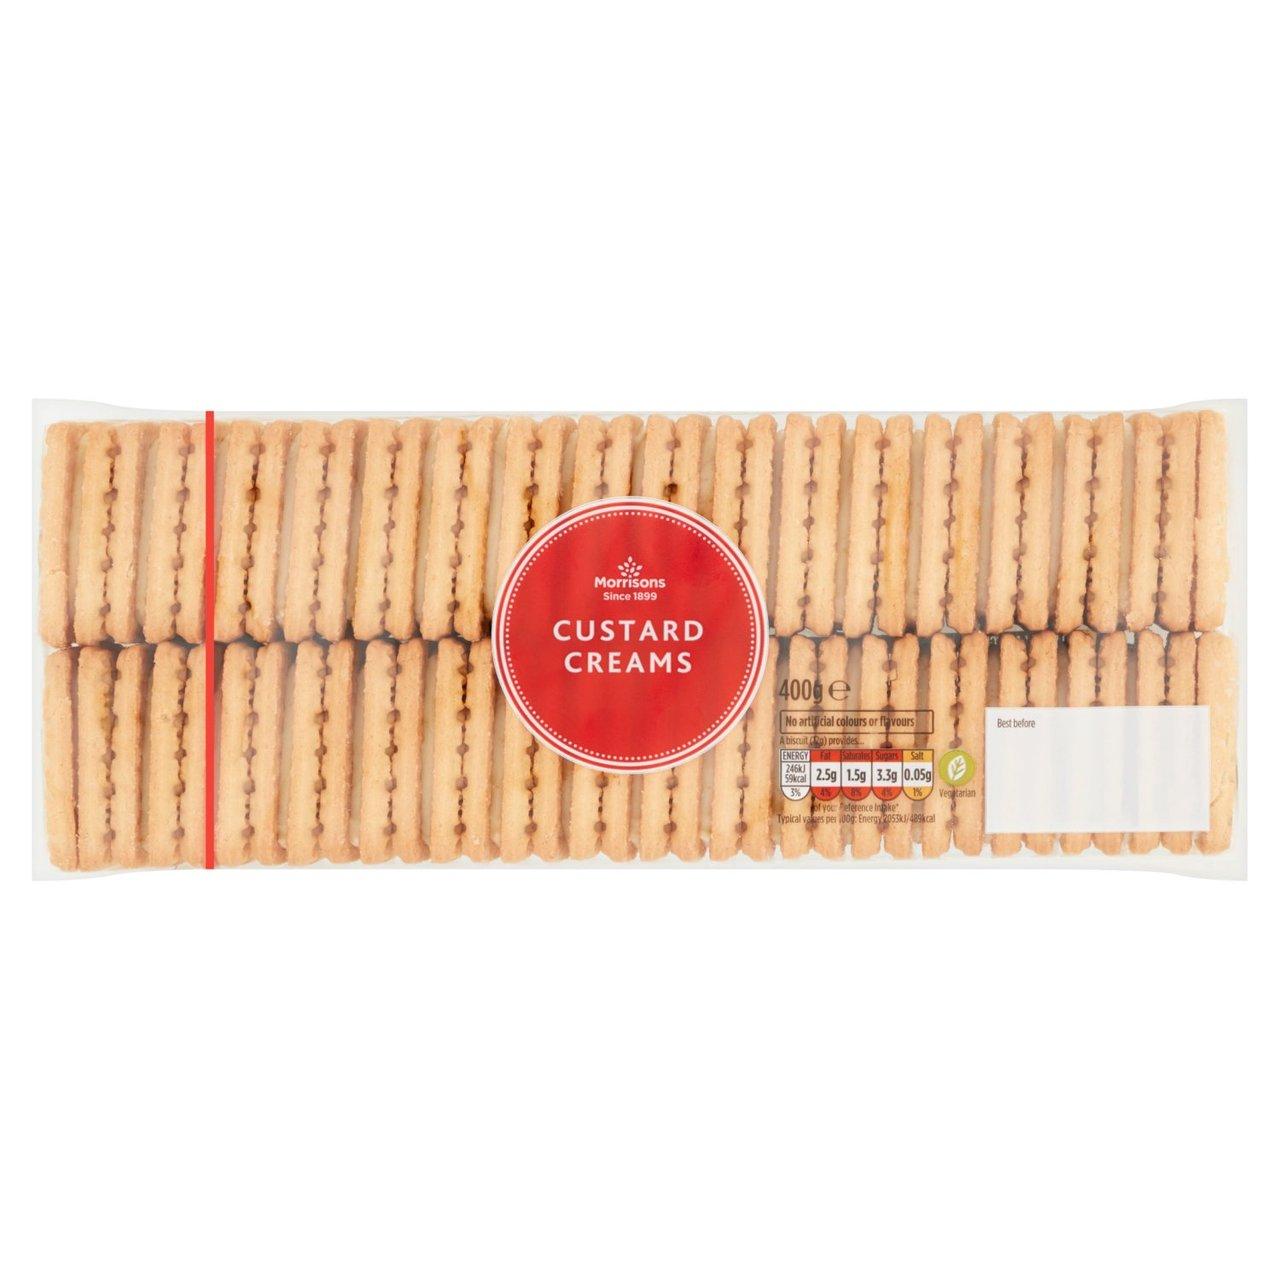 Morrisons Custard Creams Biscuits 400g 39p @ Morrisons